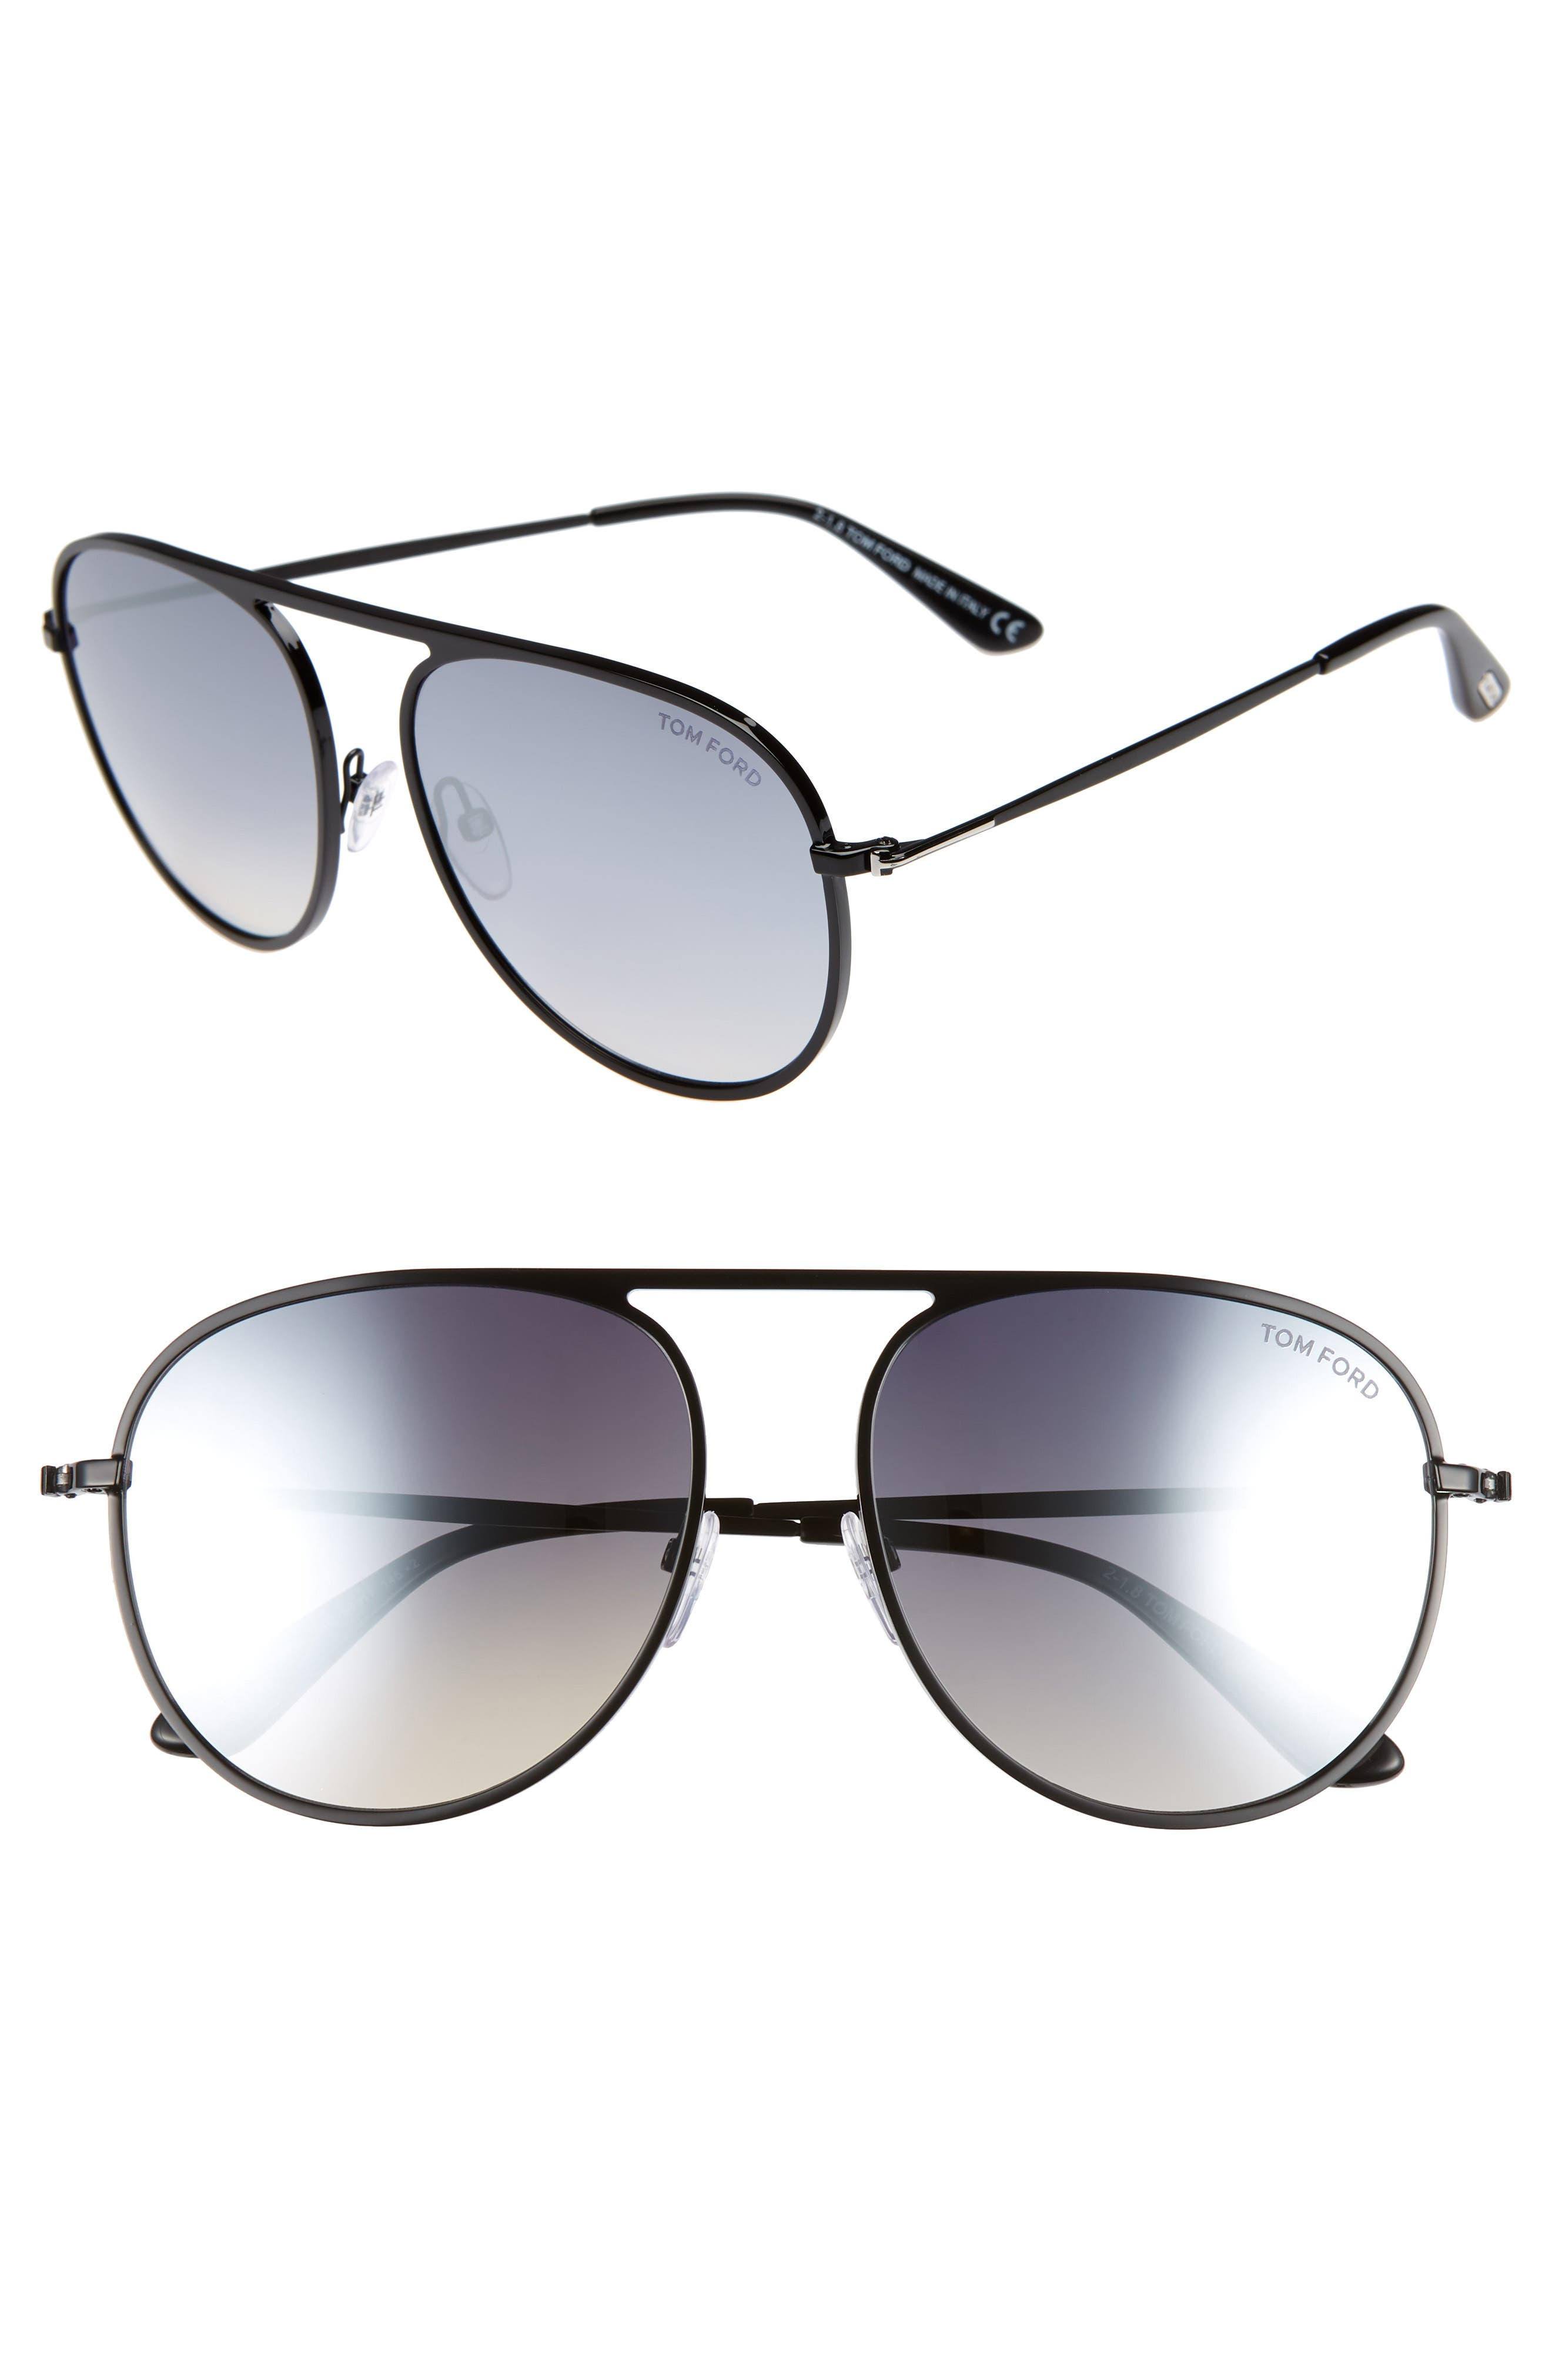 59mm Aviator Sunglasses,                             Main thumbnail 1, color,                             SHINY BLACK/ SMOKE MIRROR